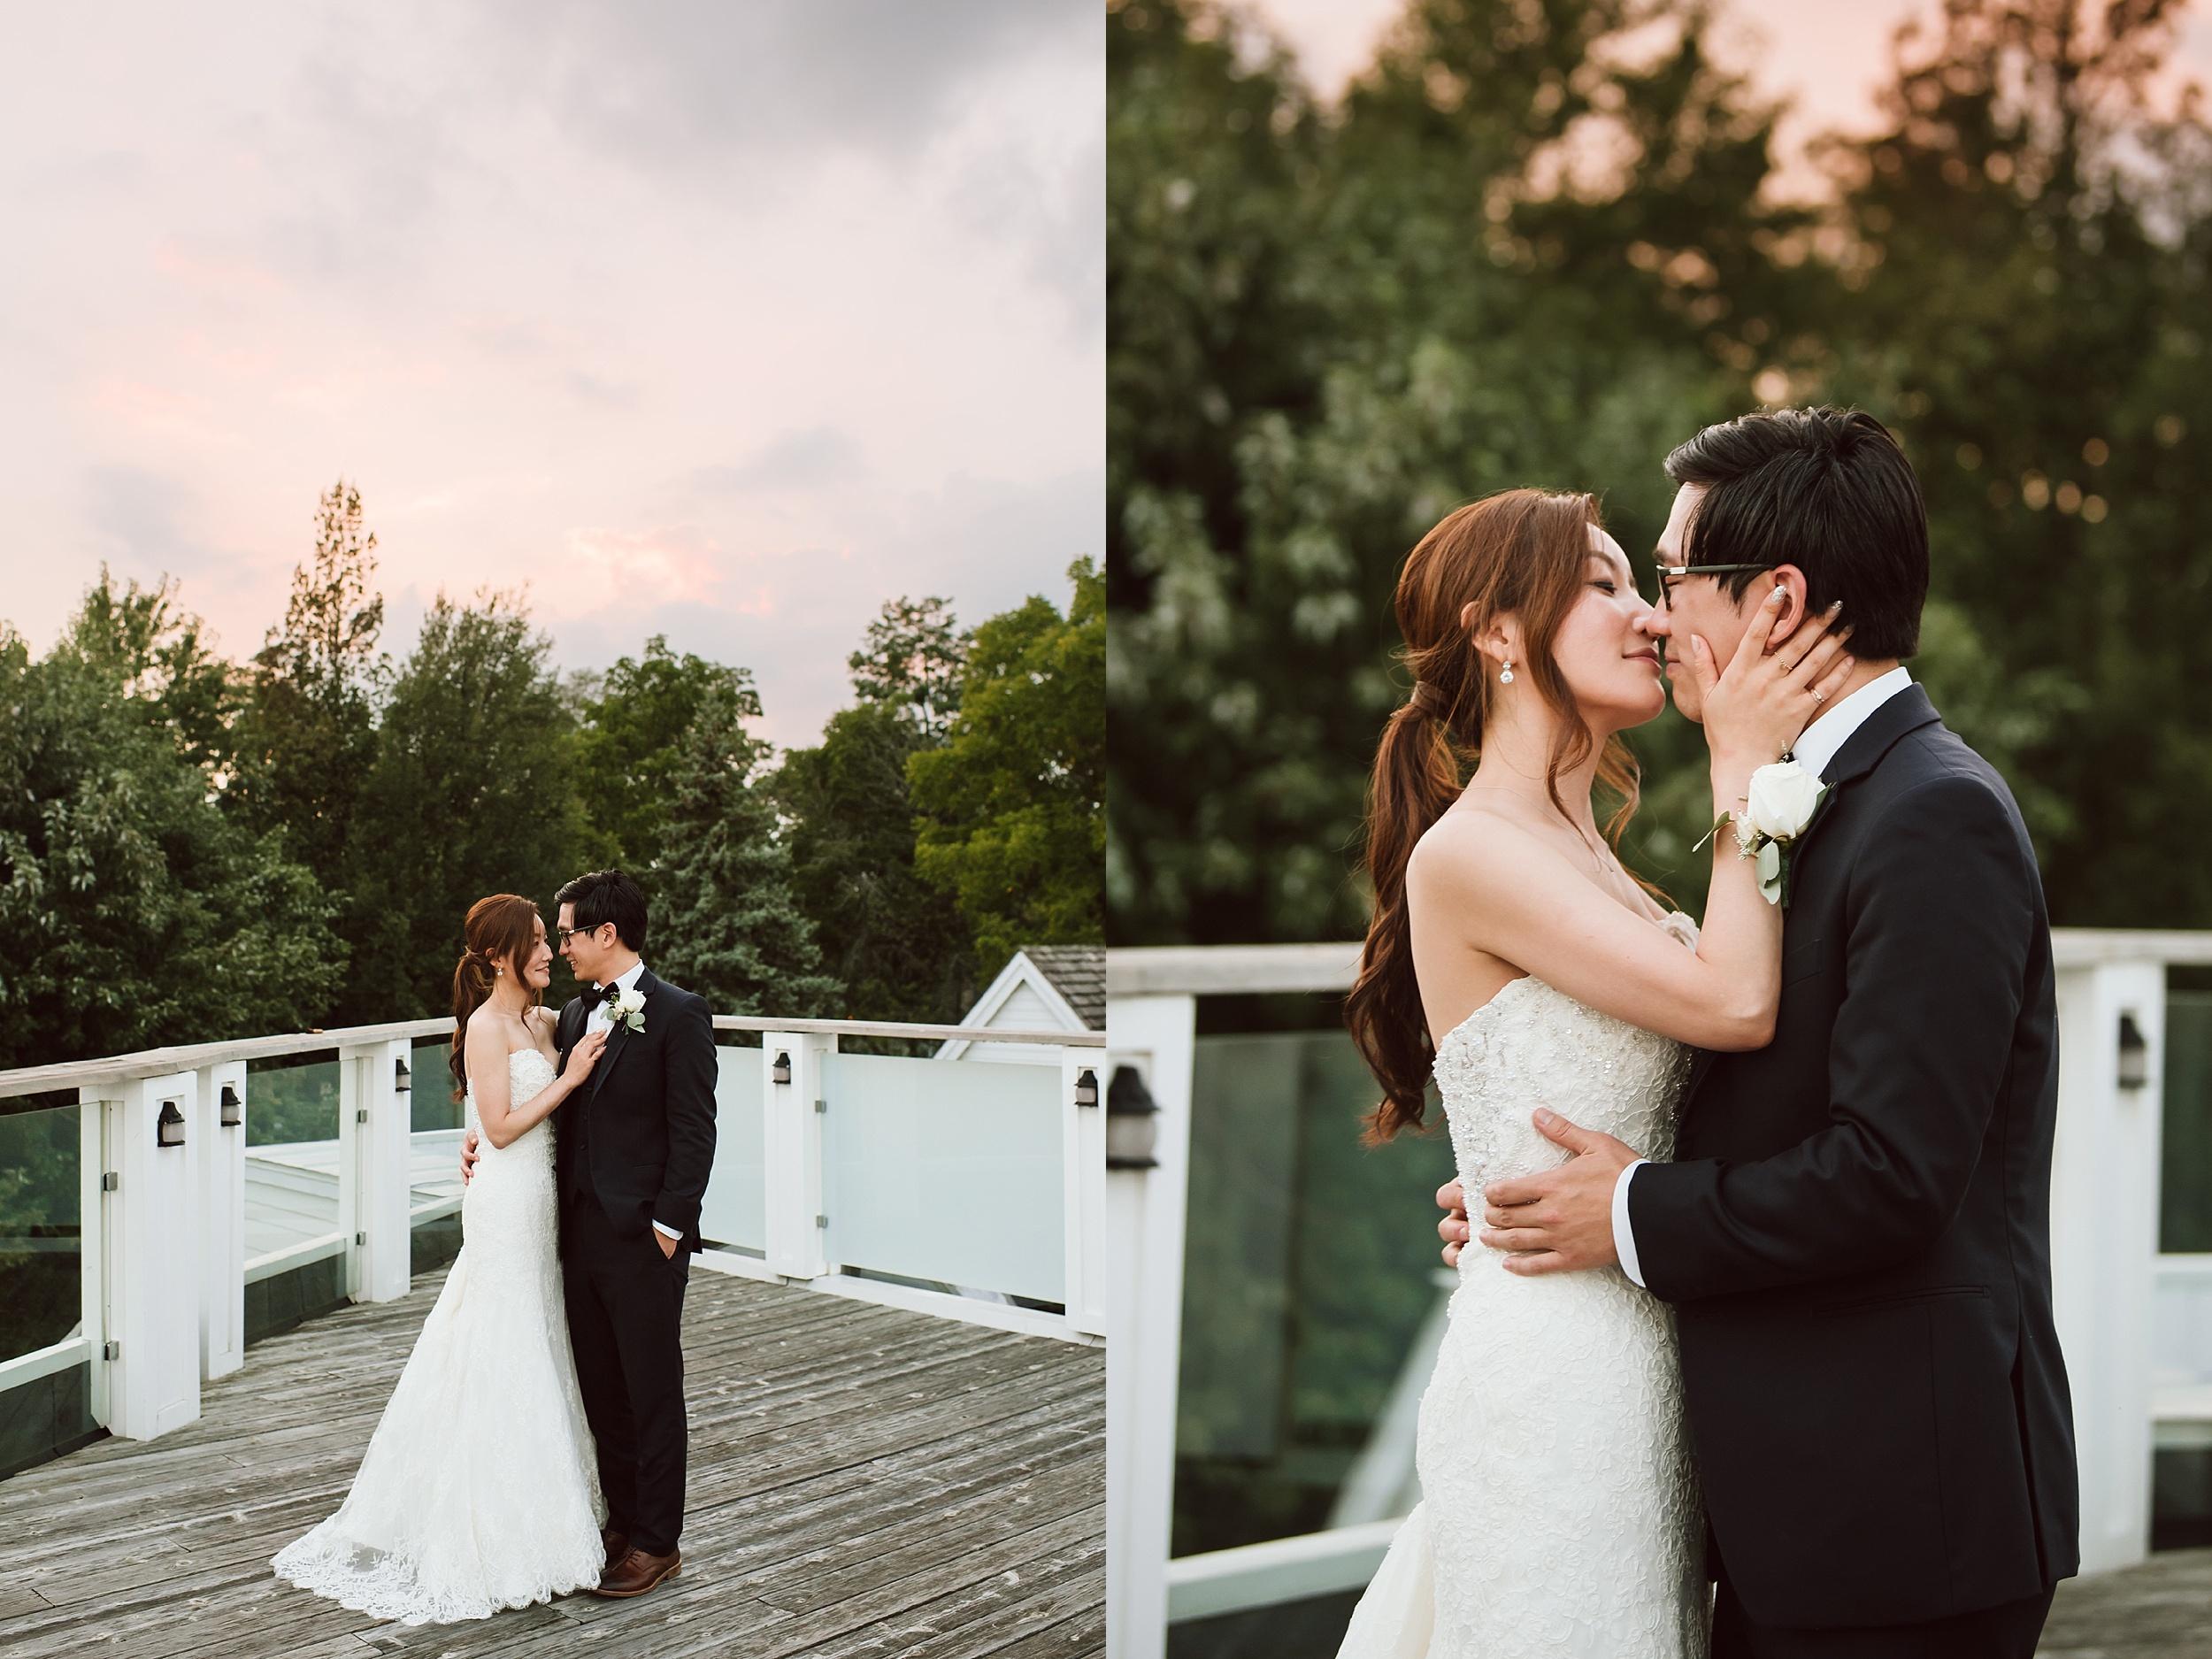 Doctors_House_Kleinburg_Wedding_Toronto_Photographer_0051.jpg